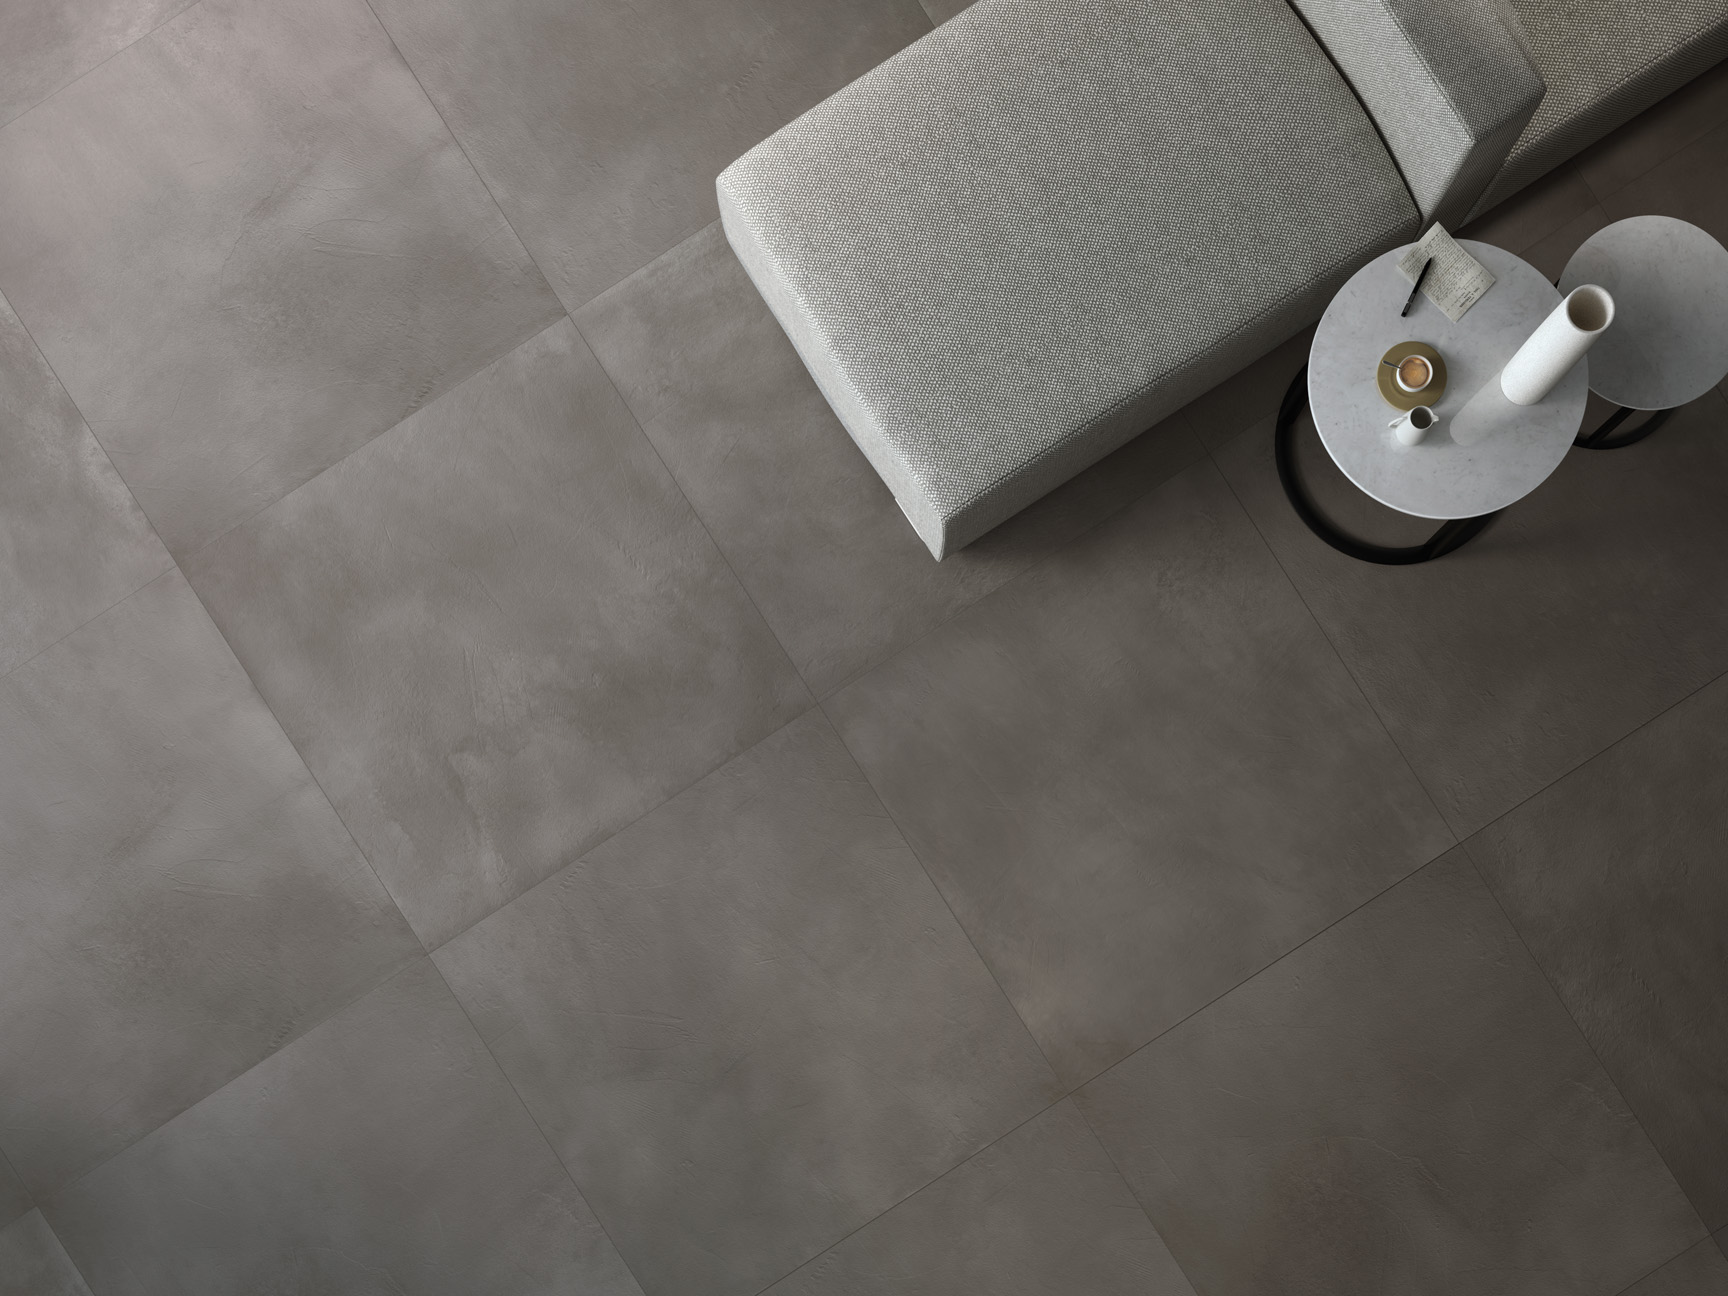 porcelain tile images: Resin Sense range high quality photo